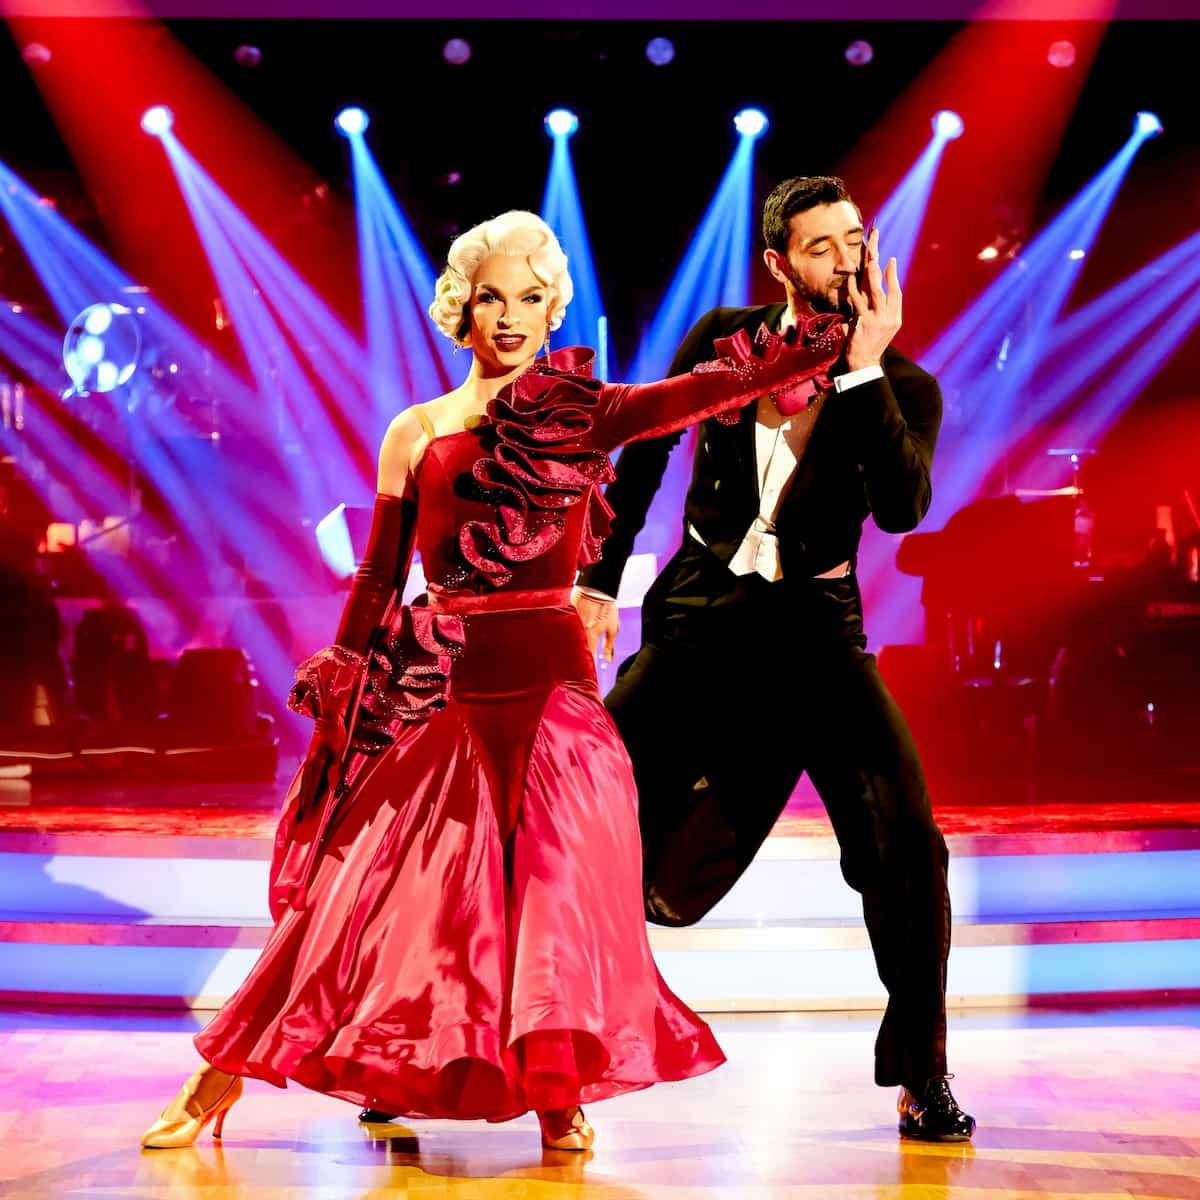 Tamara Mascara - Dimitar Stefanin bei den Dancing Stars am 6.3.2020